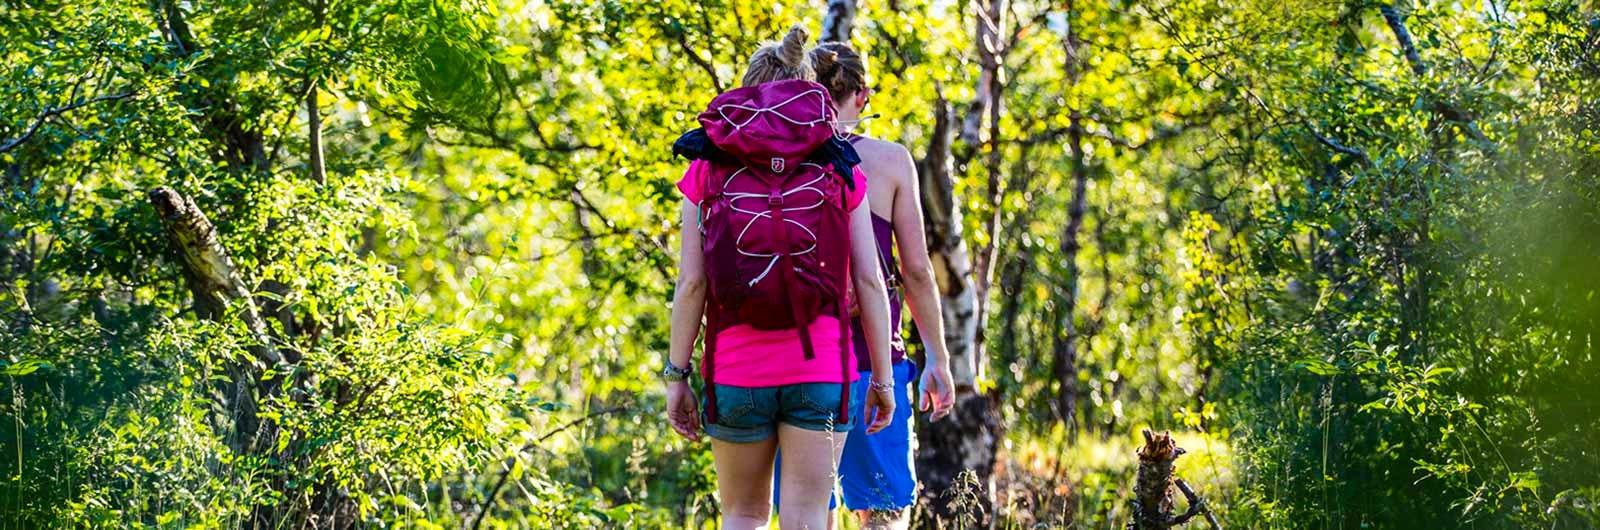 Hiking on the route Grövelsjön – Svukuriset – Grövelsjön